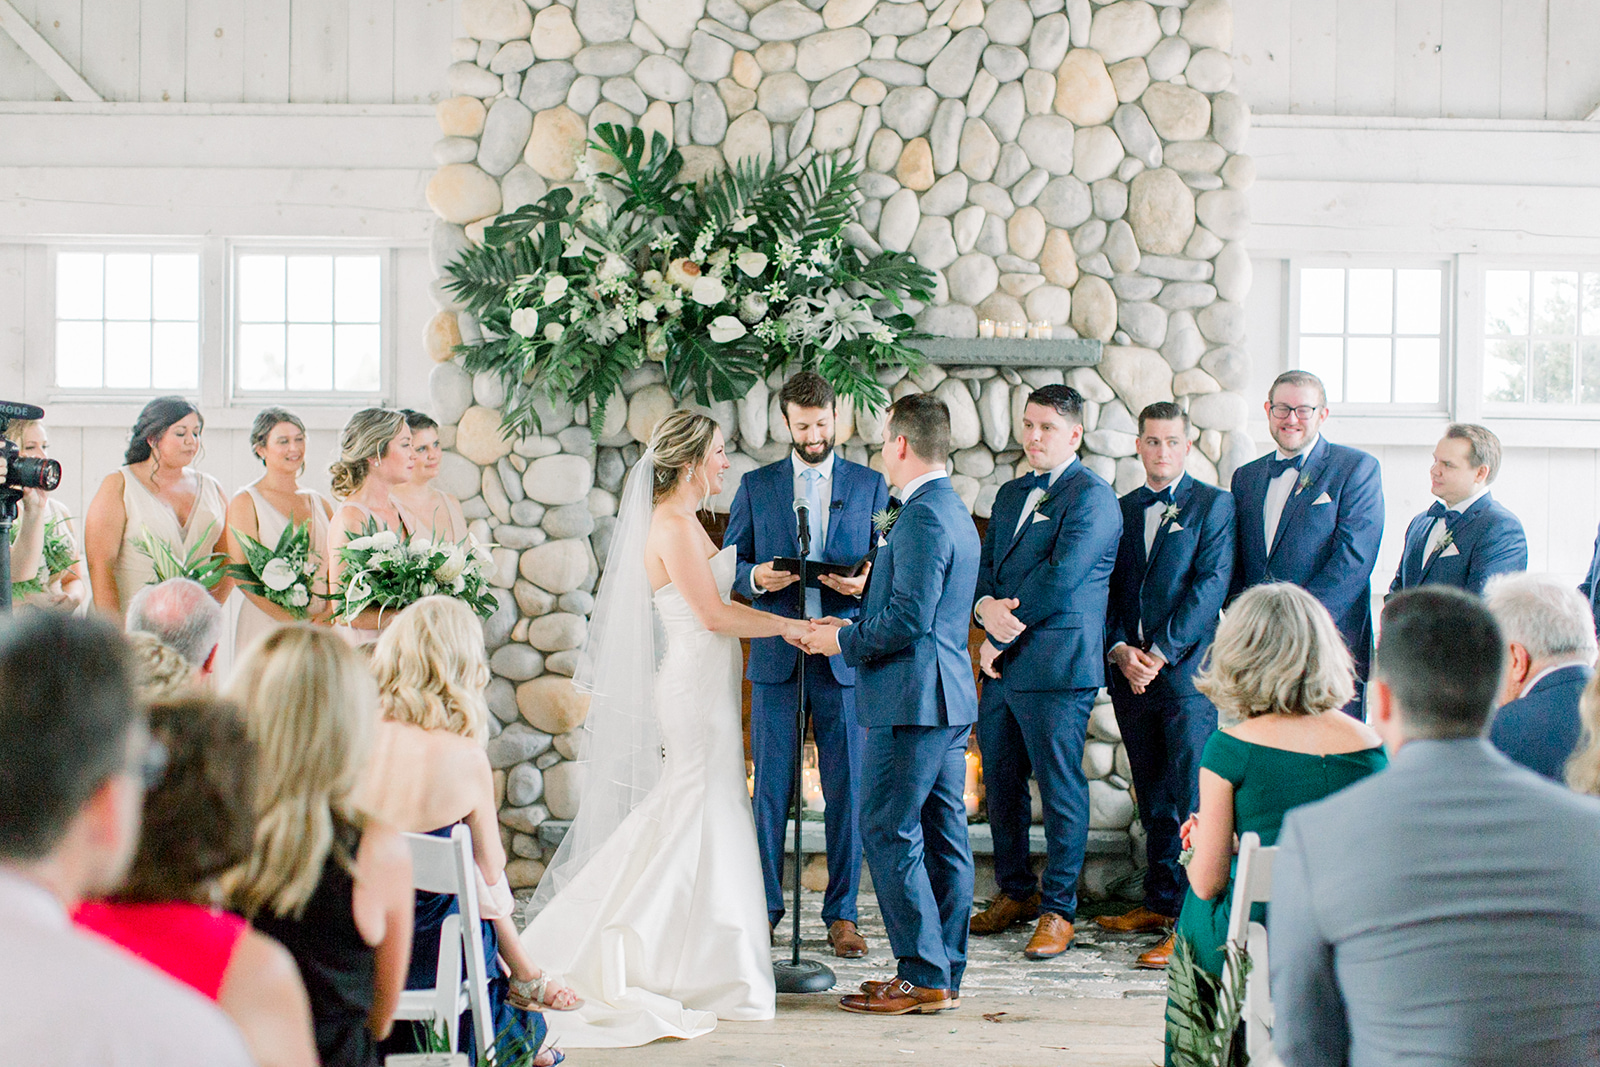 Lara_Arthur_8.18.2018_Wedding-600.jpg